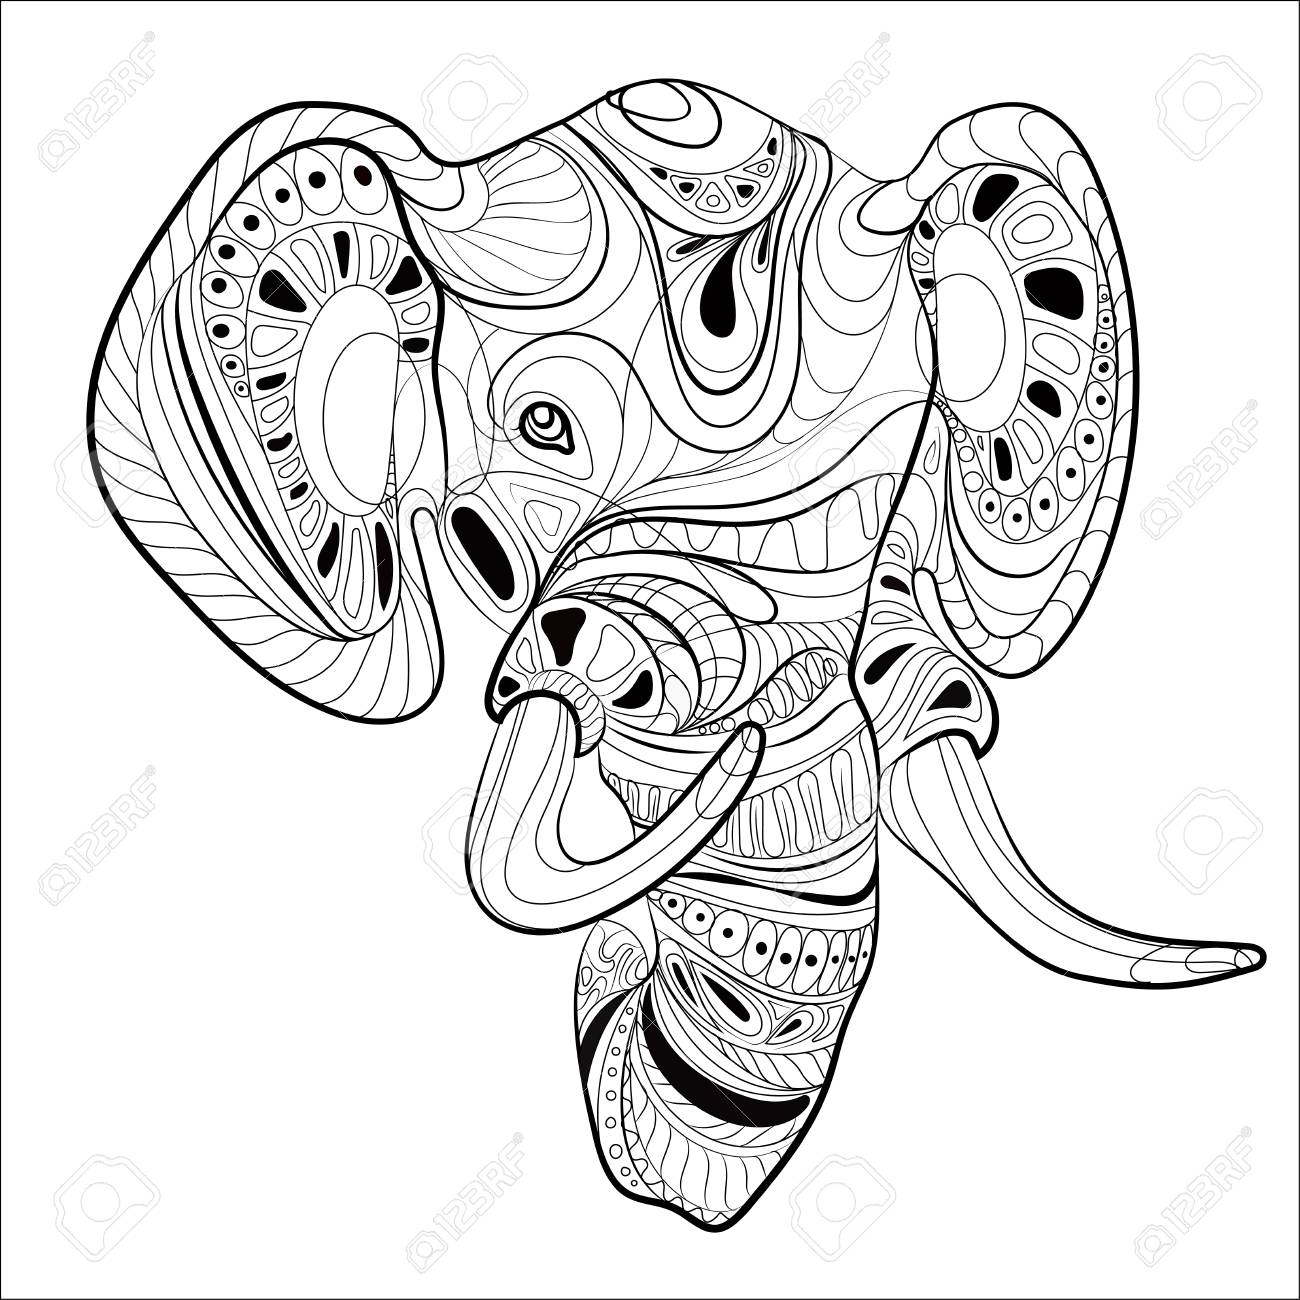 1300x1300 Stylized Head Of An Elephant. Ornamental Portrait Of An Elephant